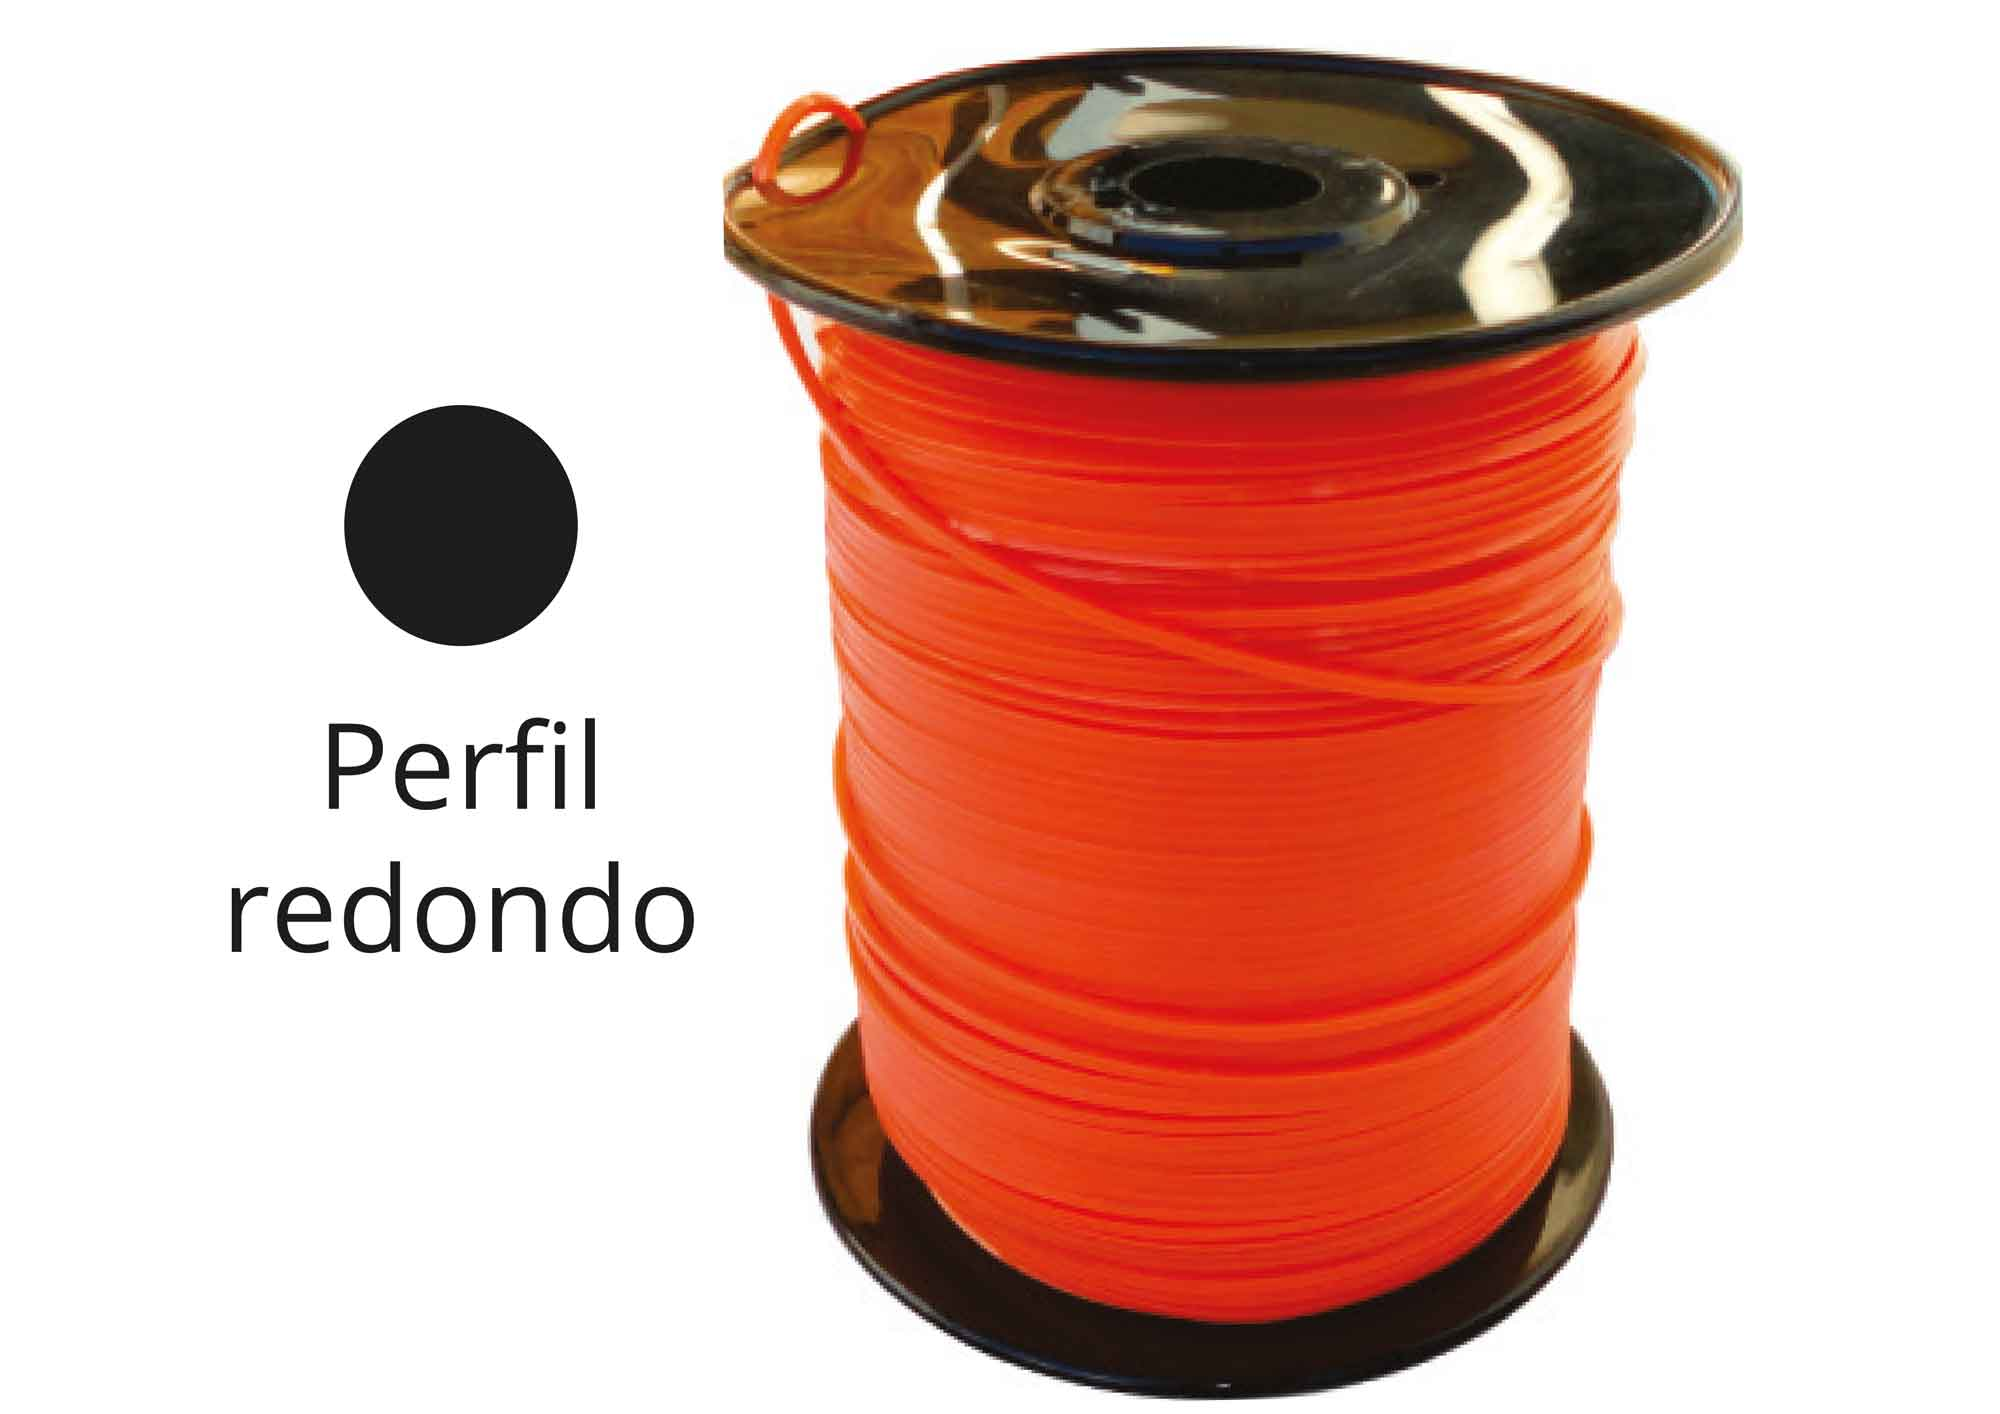 FIO NYLON REDO 2.5MM - 2 KG/ 355 MTS